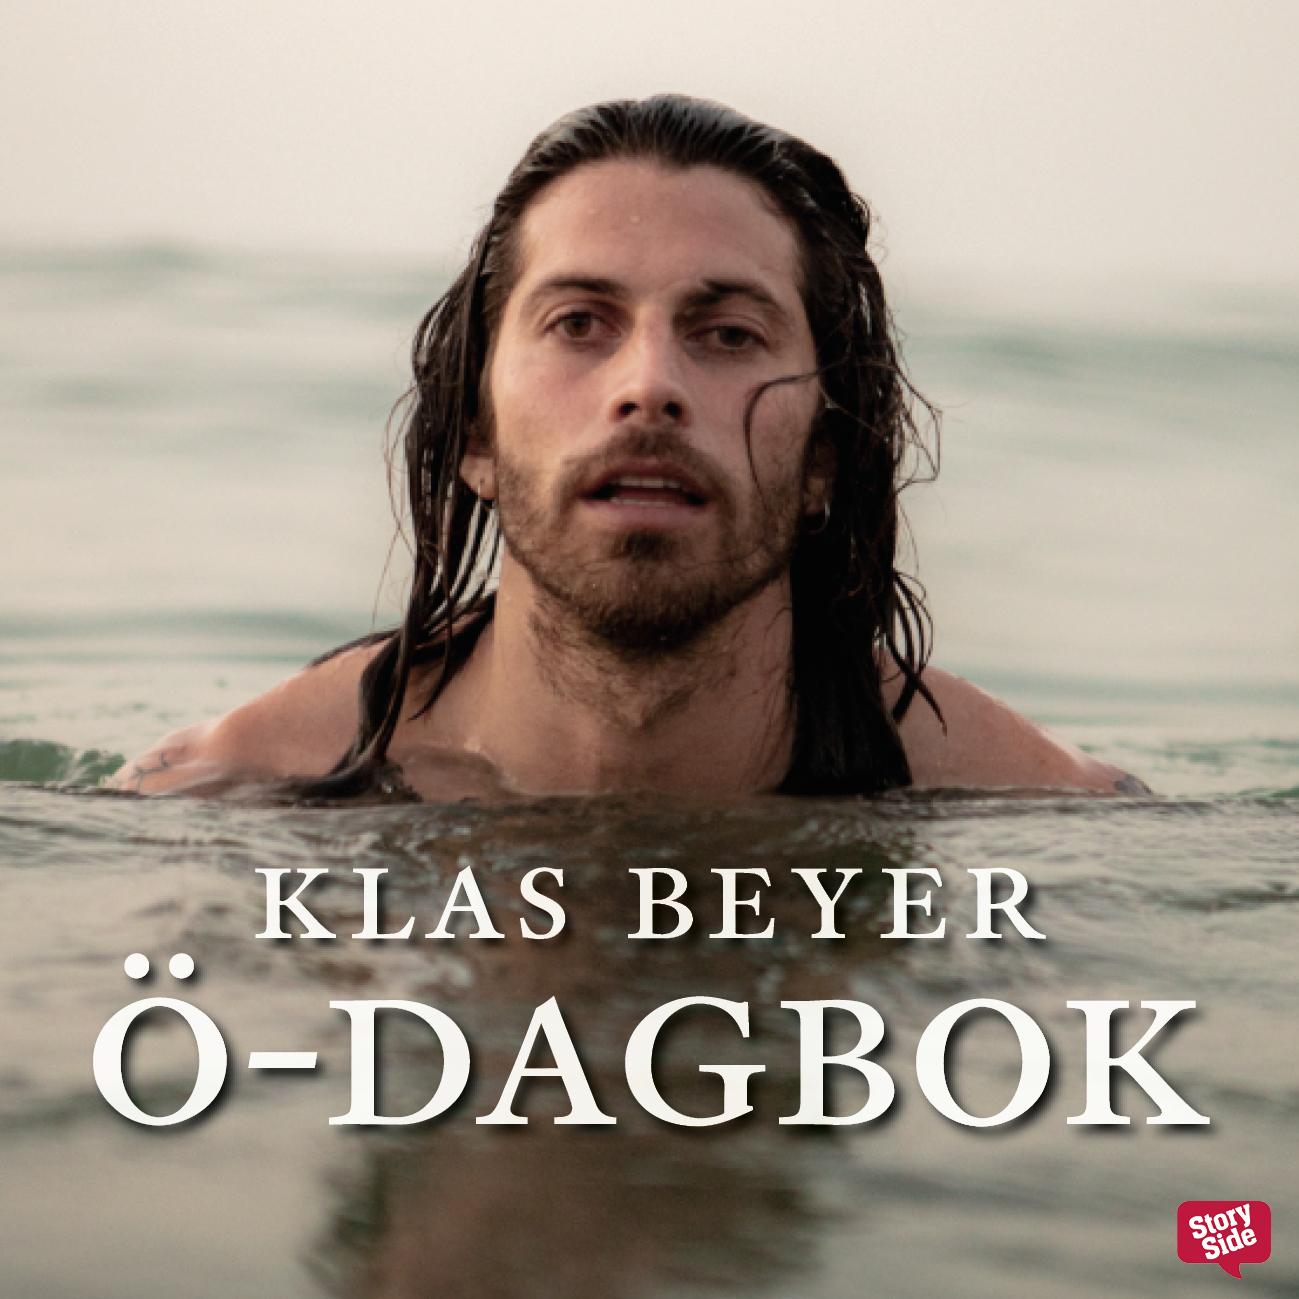 Klas Beyer ö-dagbok